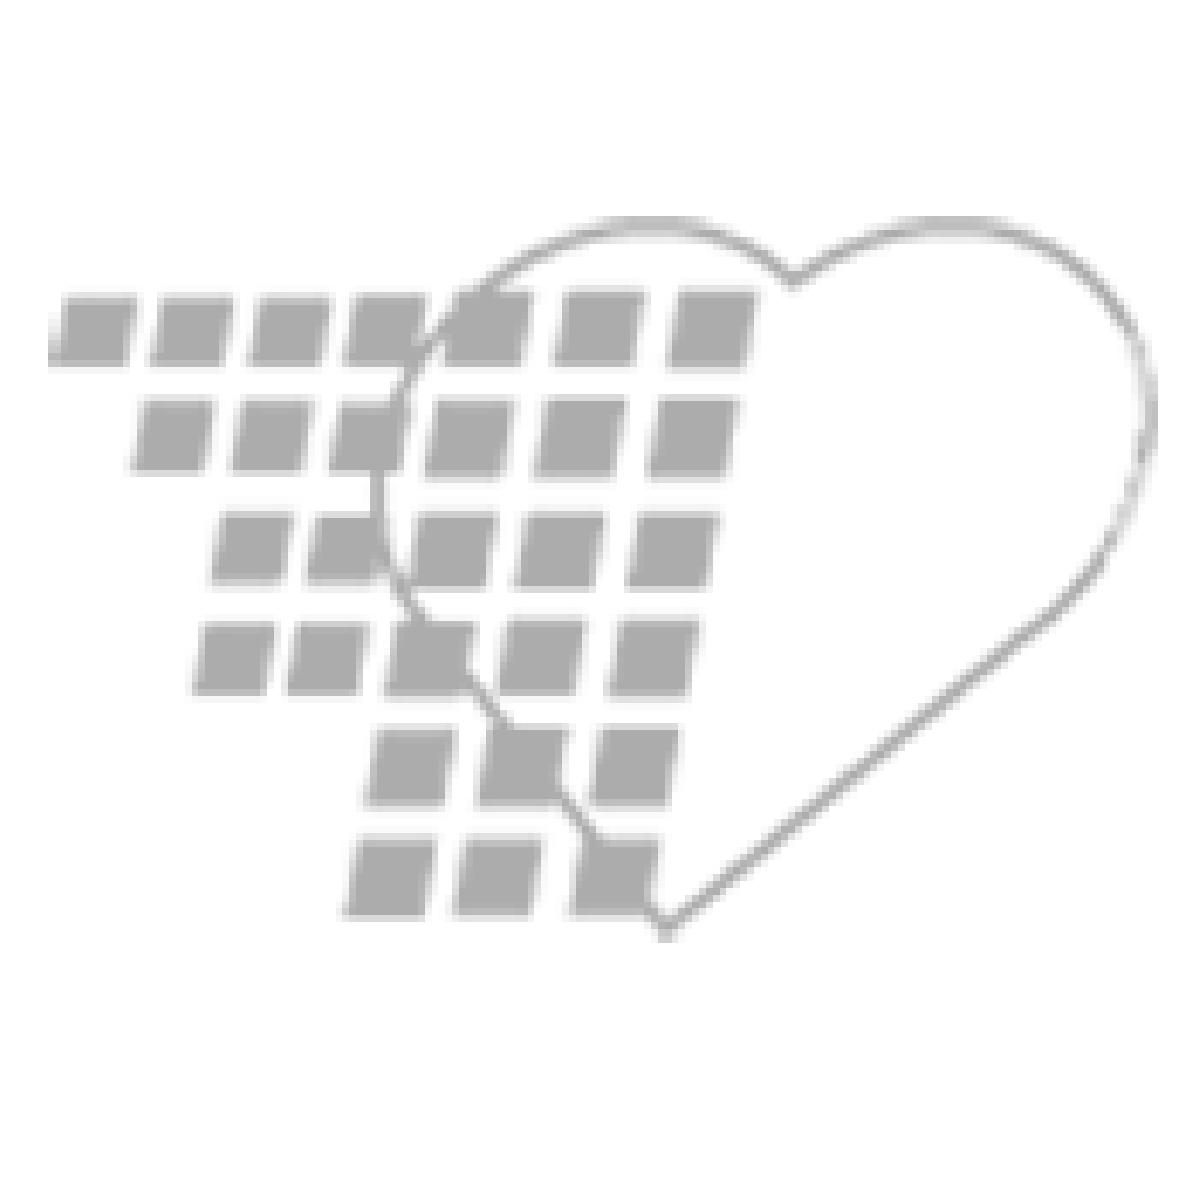 11-99-0206 Humerus Injection Pad/Bone